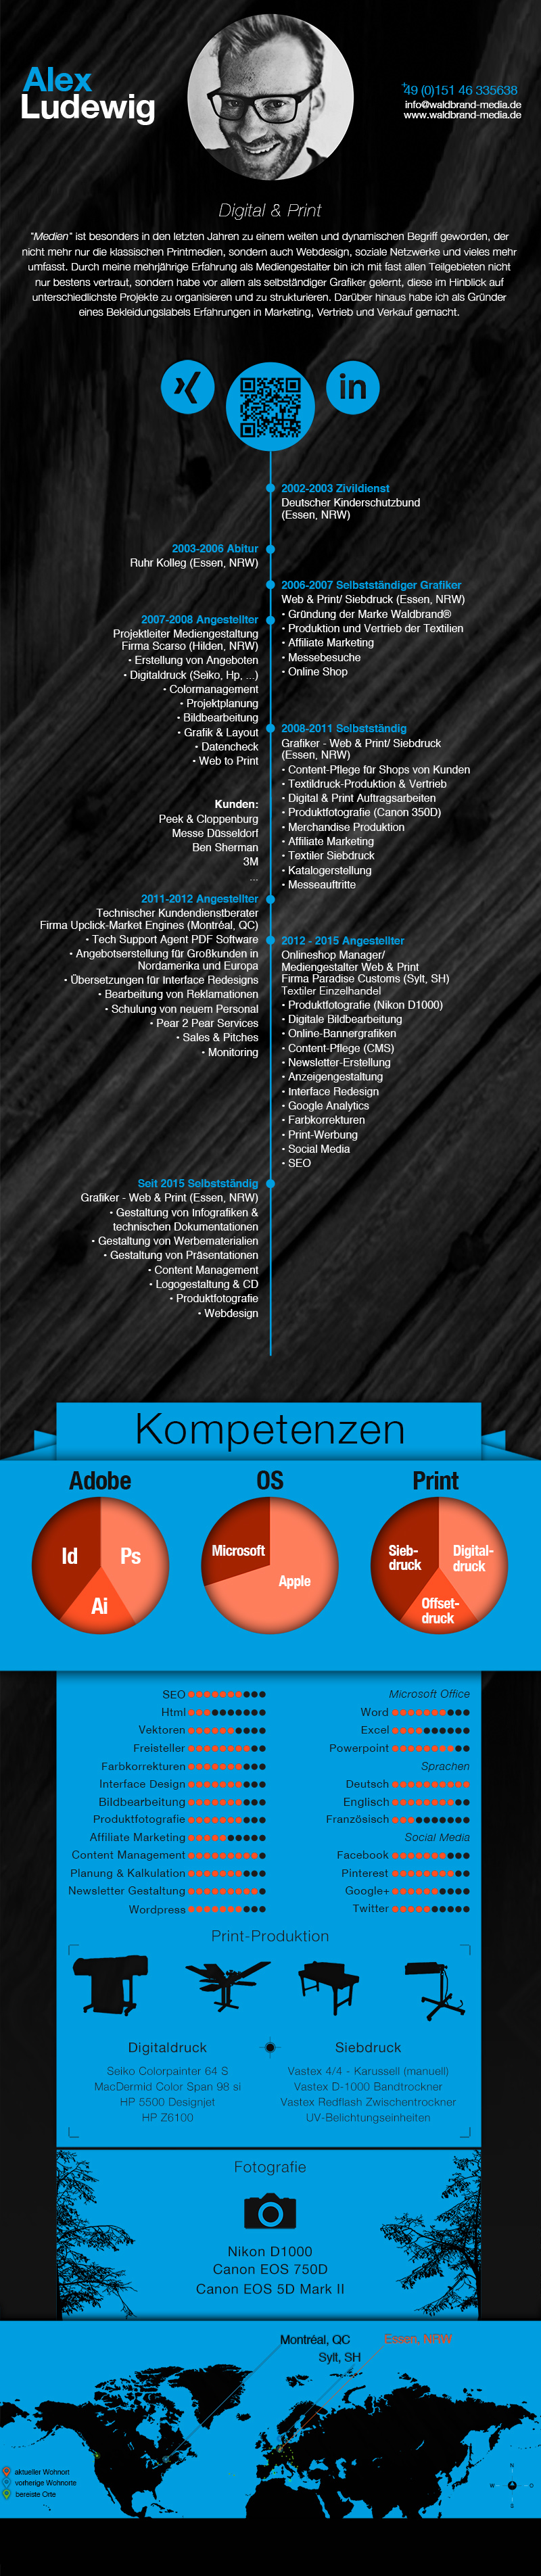 resume, cv, design, gestaltung, grafik, waldbrand media, kreativbüro, webdesign, screenedesign, siebdruck, fotografie, bildbearbeitung